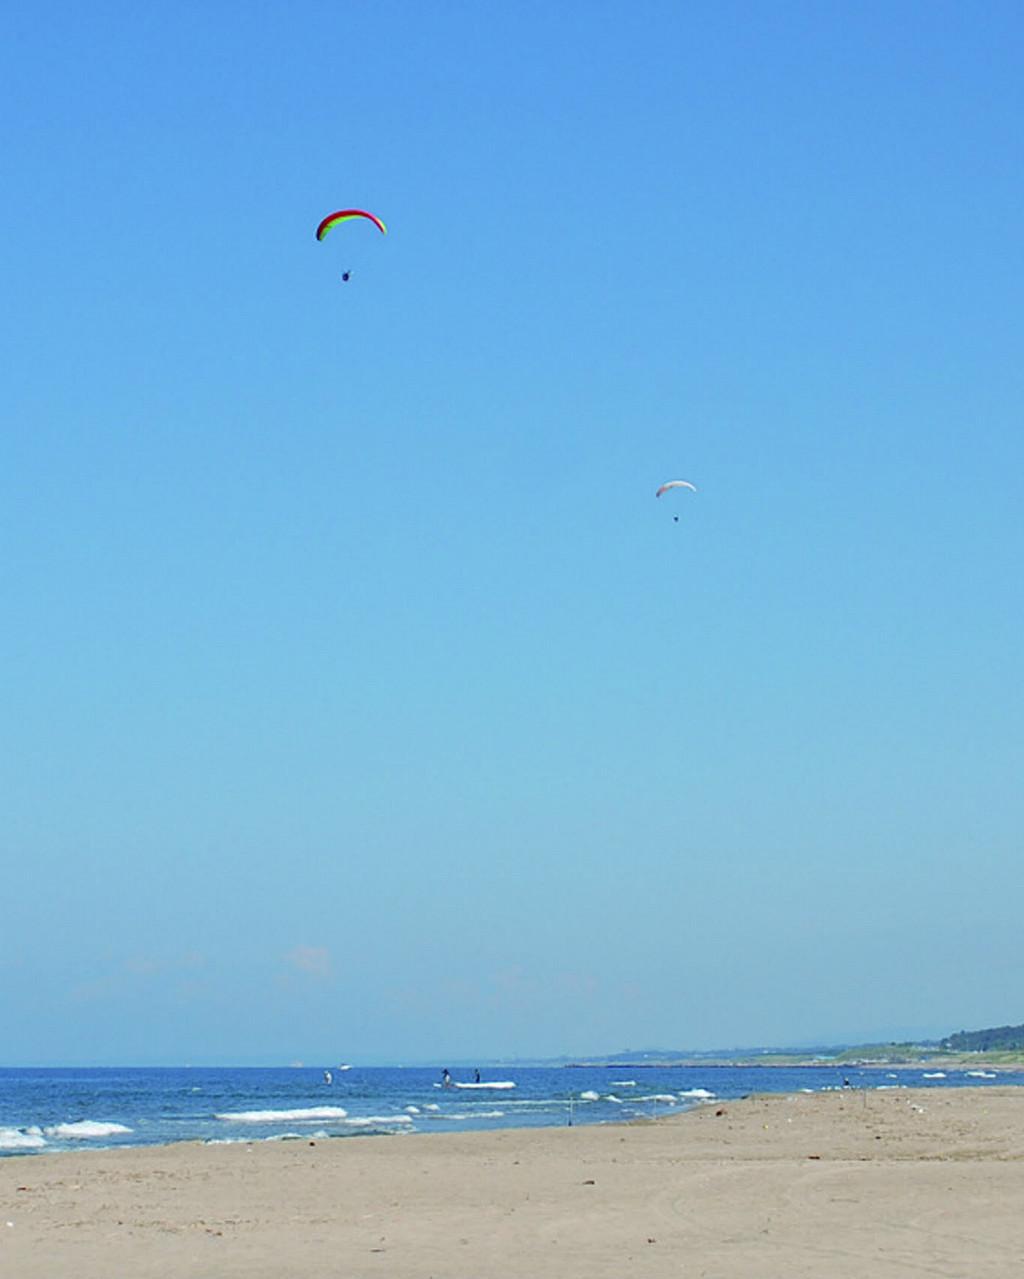 Uchinada beach, image by Uchinada Tourism Association